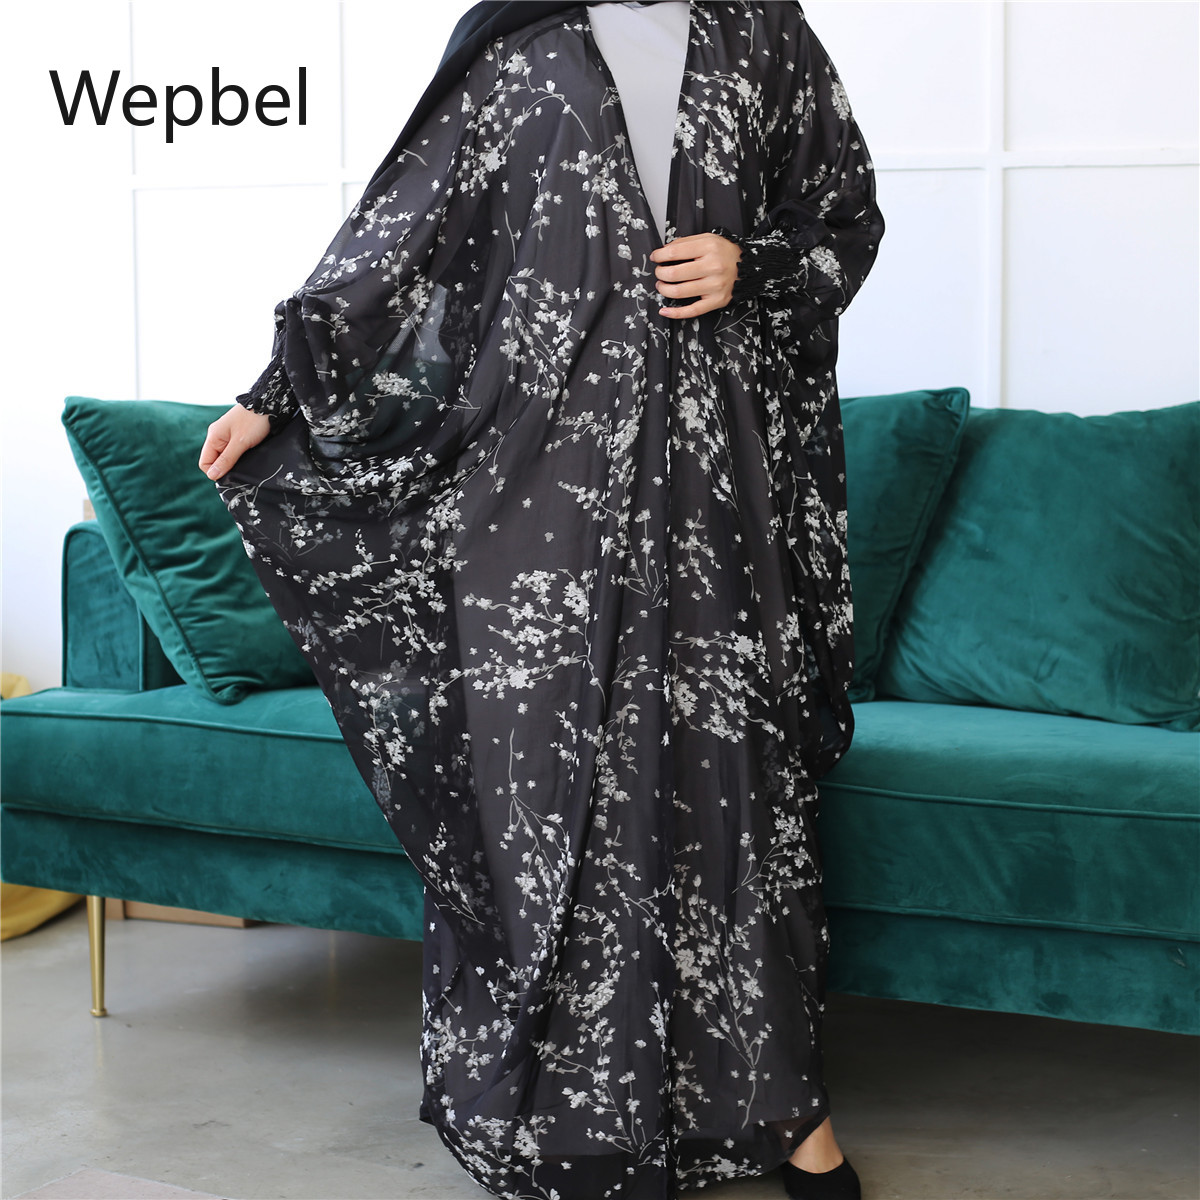 WEPBEL Summer Chiffon Muslim Islamic Robe Plus Size Batwing Sleeve Arab Duabi Cardigan Muslim Dress Fashion Casual Kimono